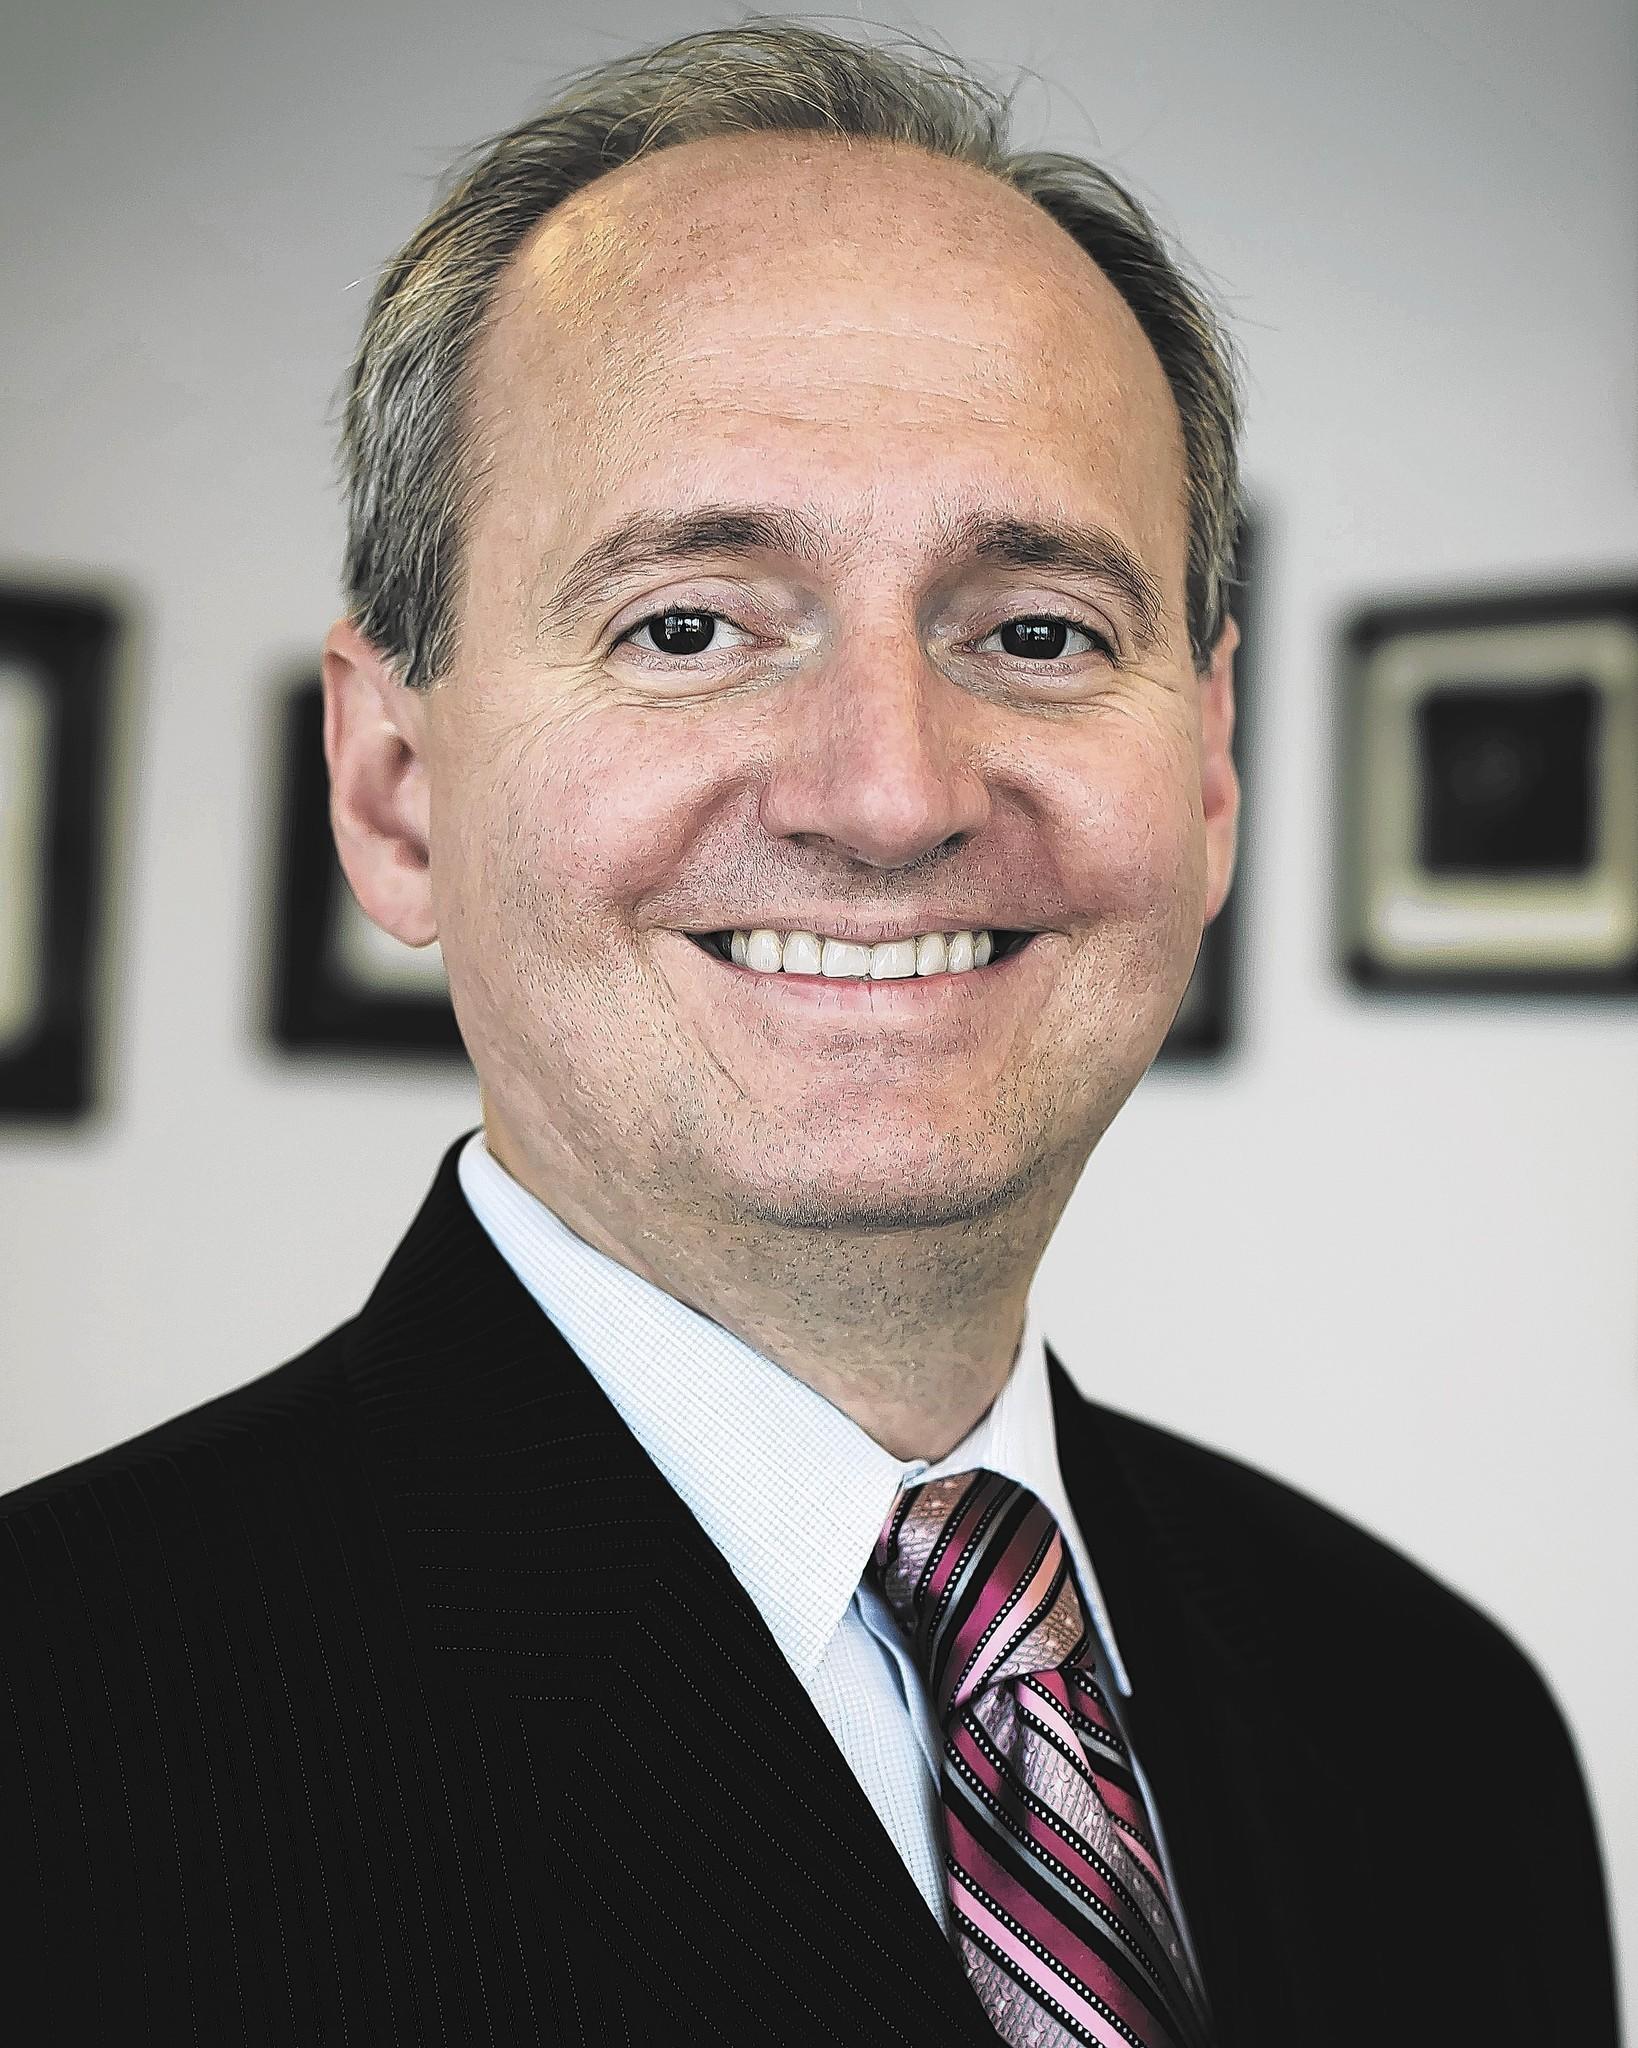 Orange County Tax Collector Scott Randolph